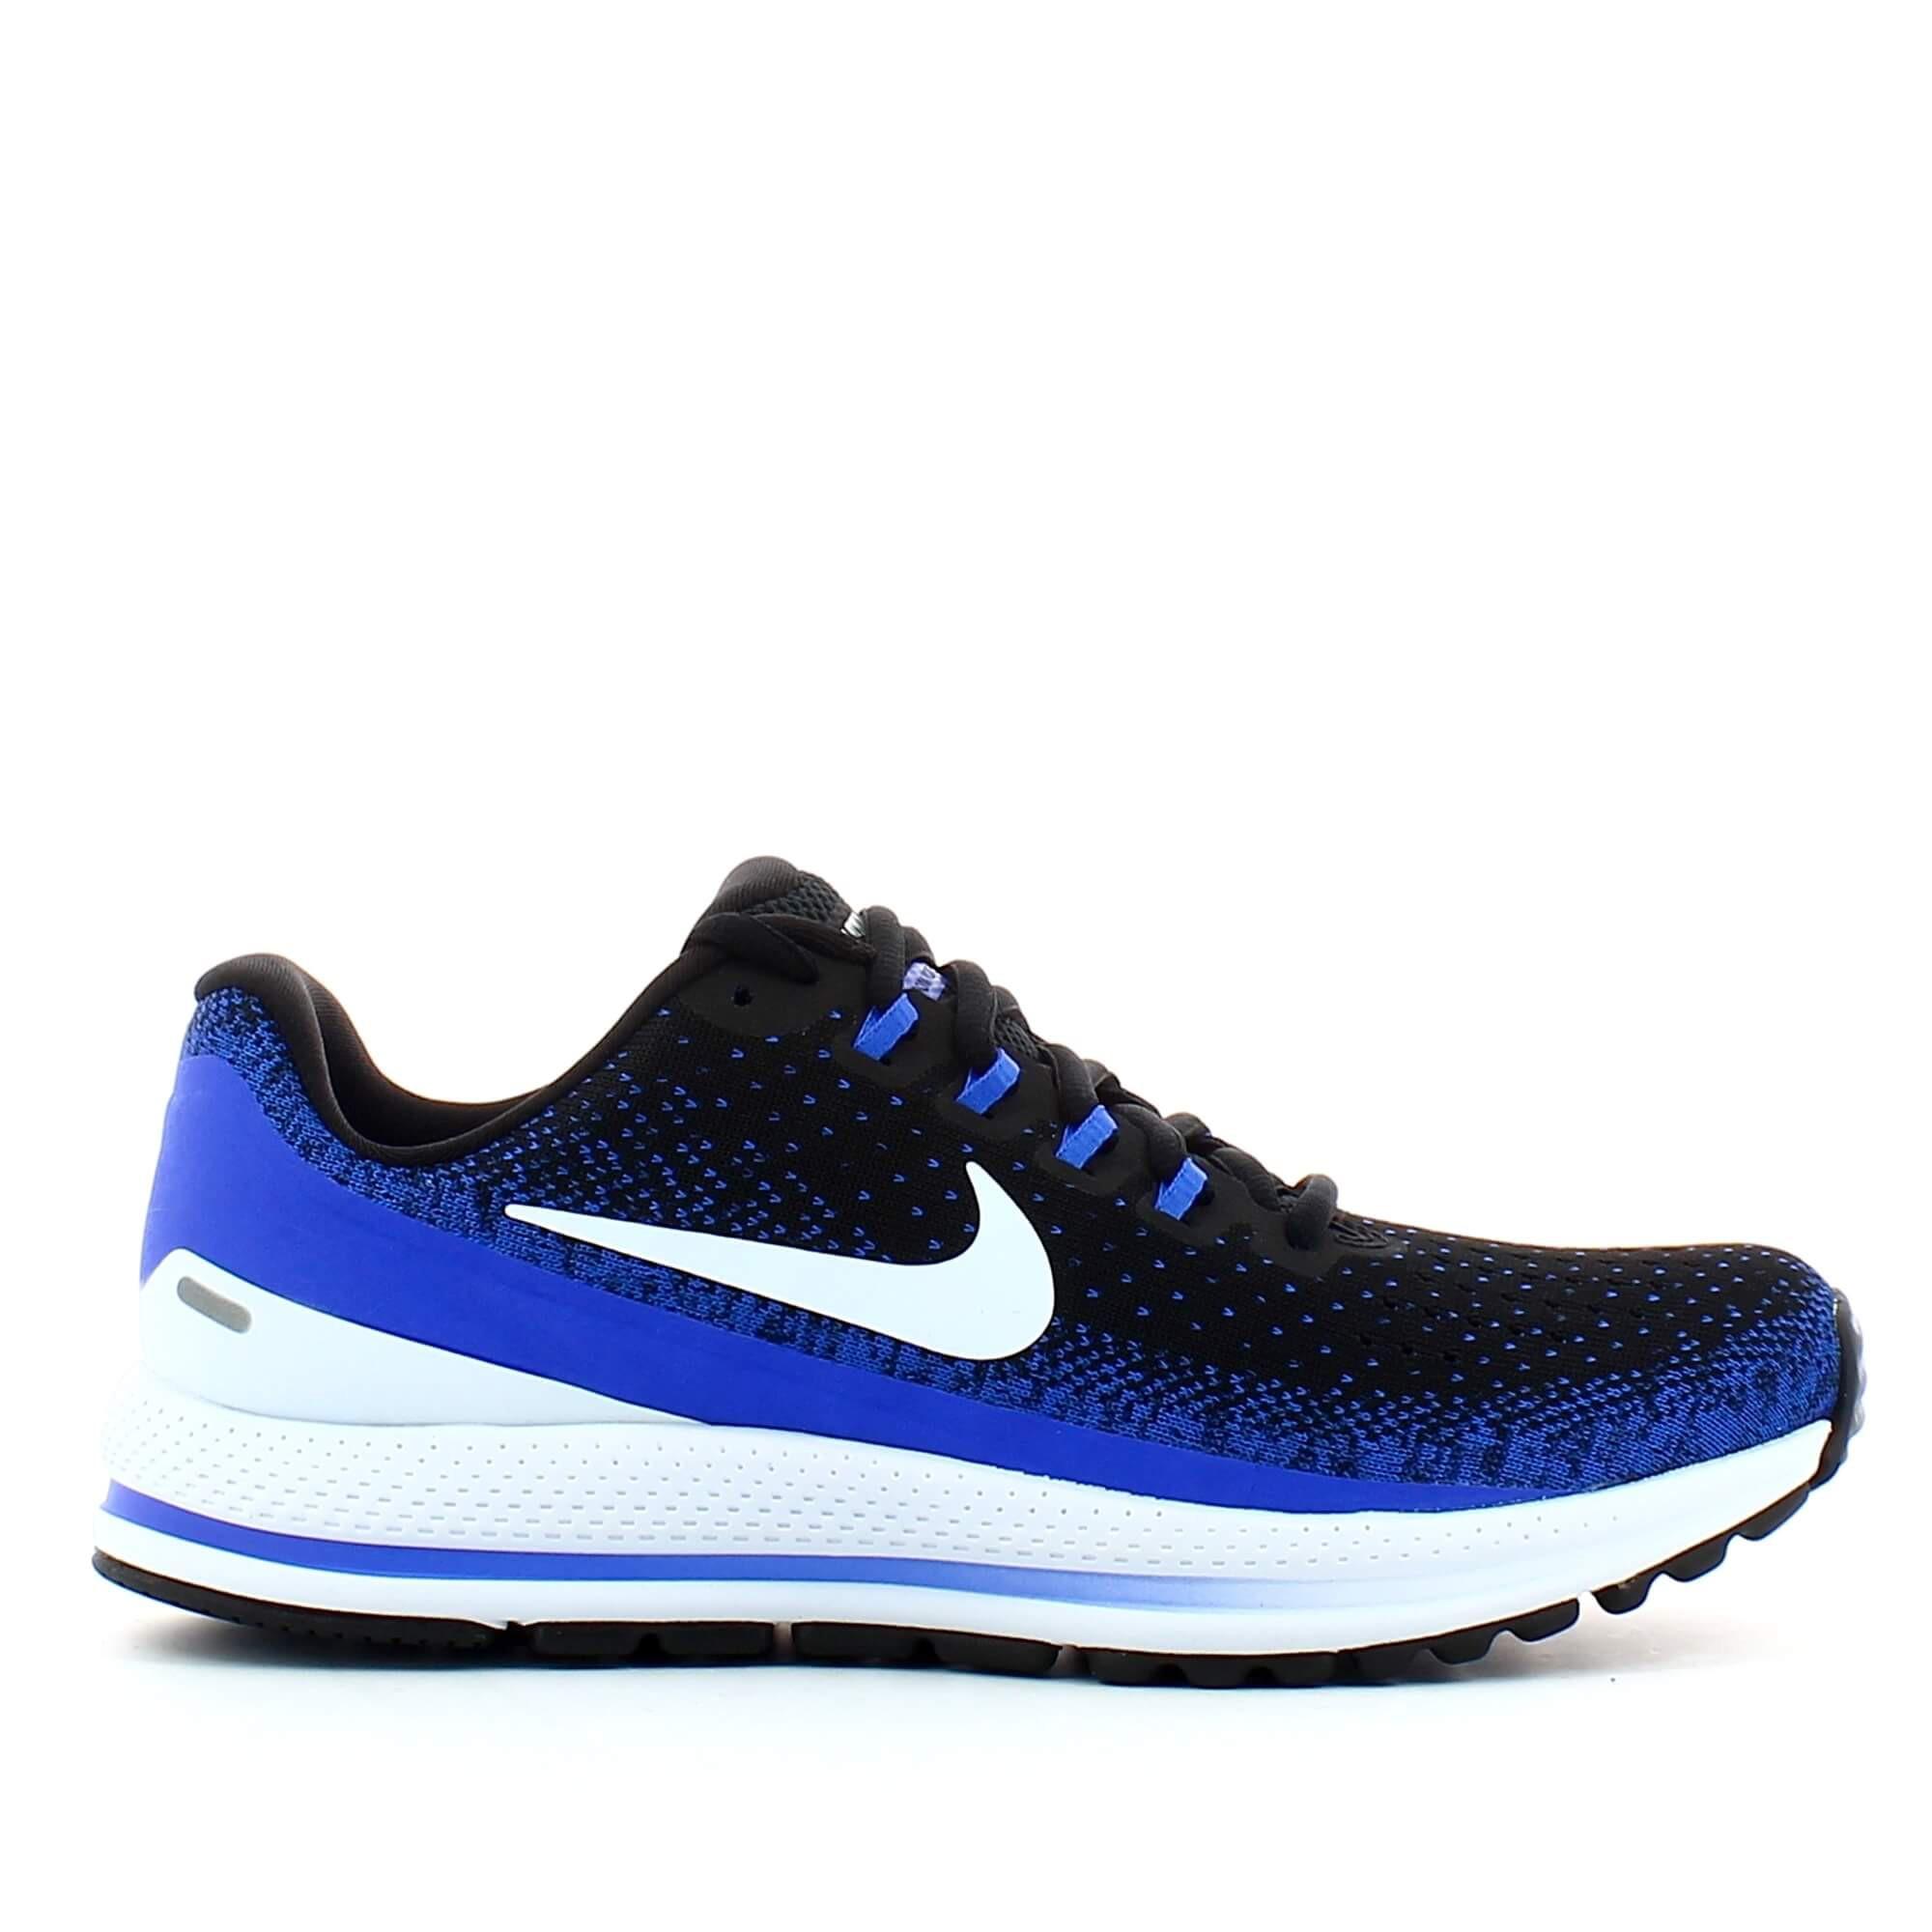 super popular fecha de lanzamiento zapatos casuales closeout nike zoom vomero azul 283e5 962f7